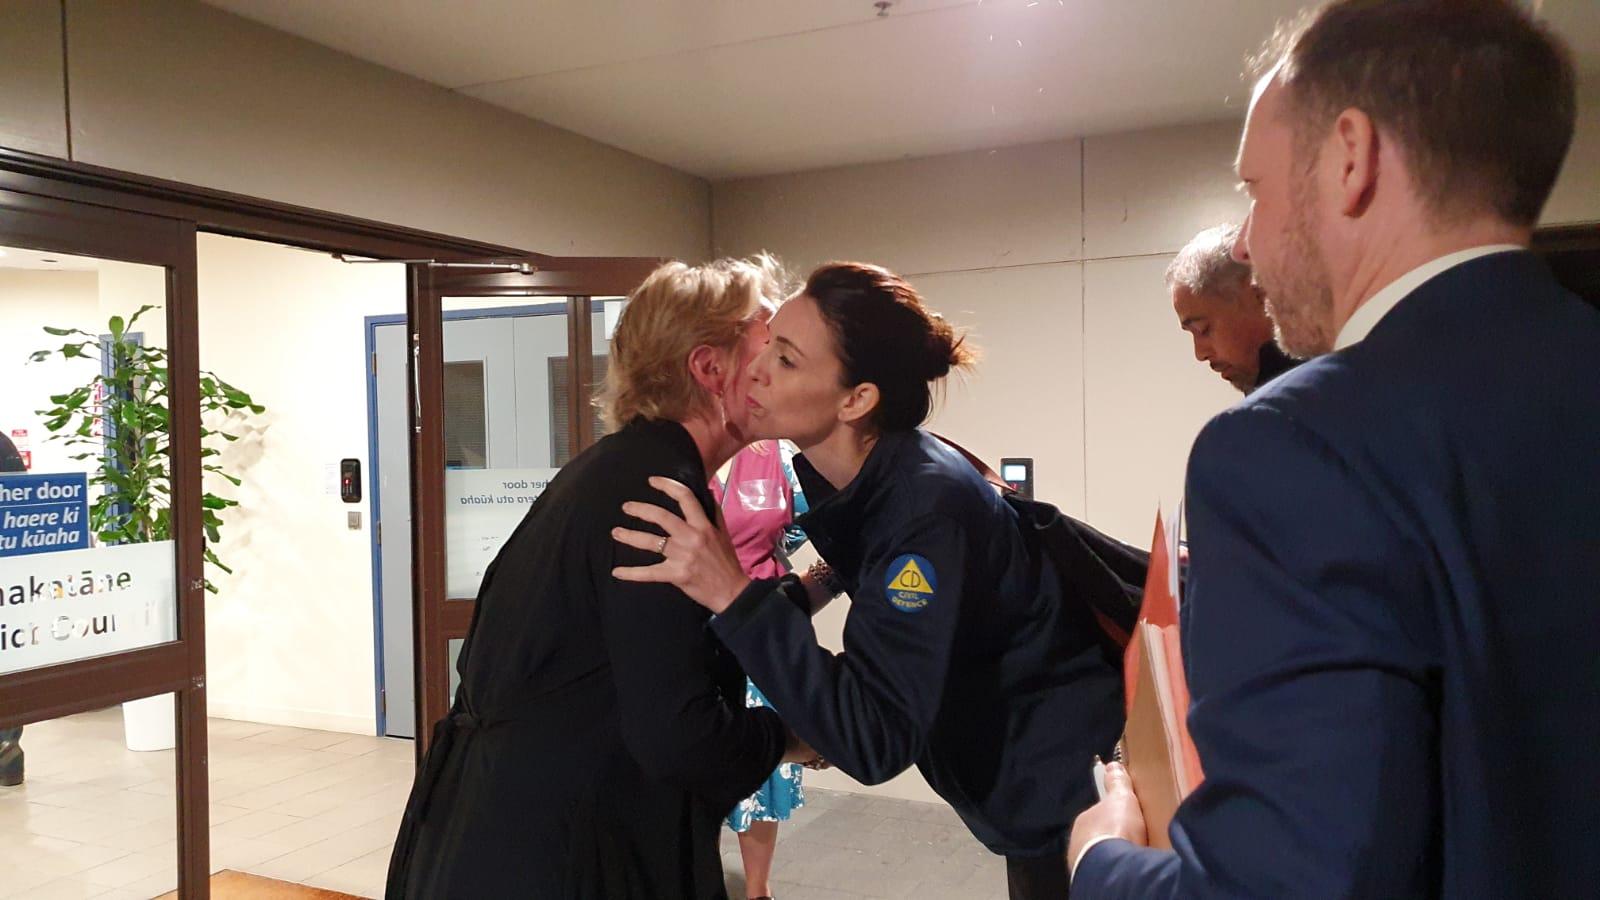 New Zealand Prime Minister Jacinda Ardern arriving in Whakatane, New Zealand.